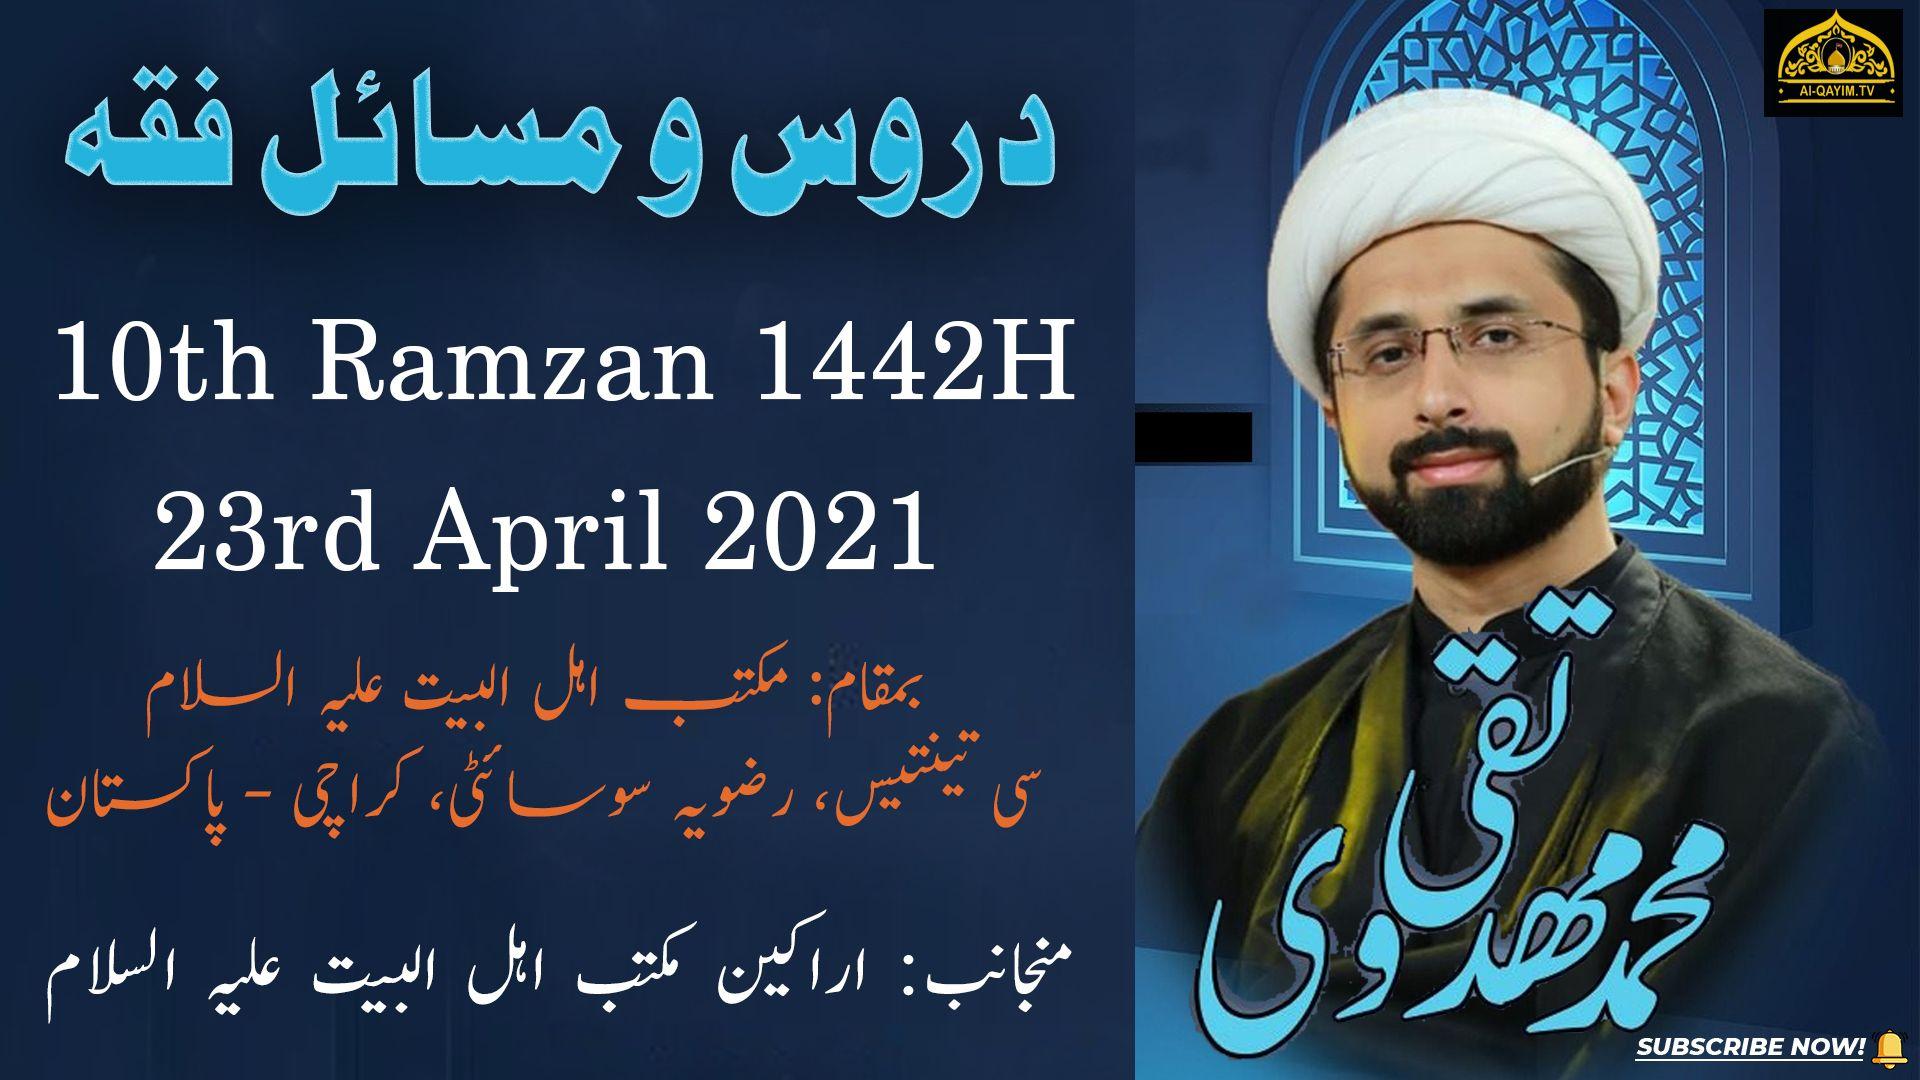 Moulana Muhammad Taqi Mehdavi | Dars Wo Masail Fiqae | 10th Ramzan 2021 | Maktab-e-Ahlebait, Karachi